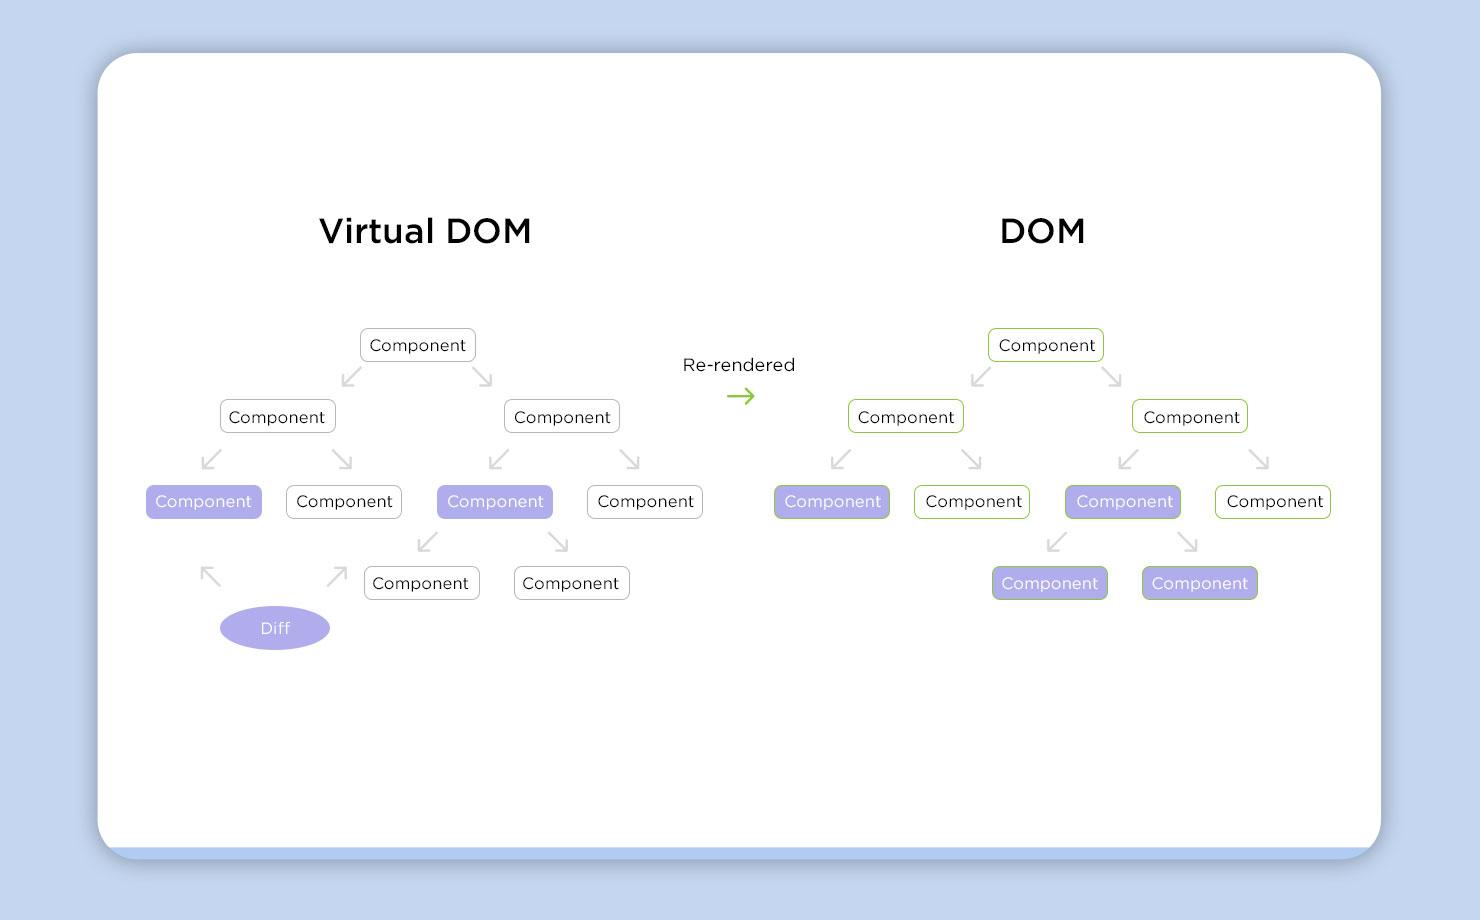 Virtual DOM vs DOM